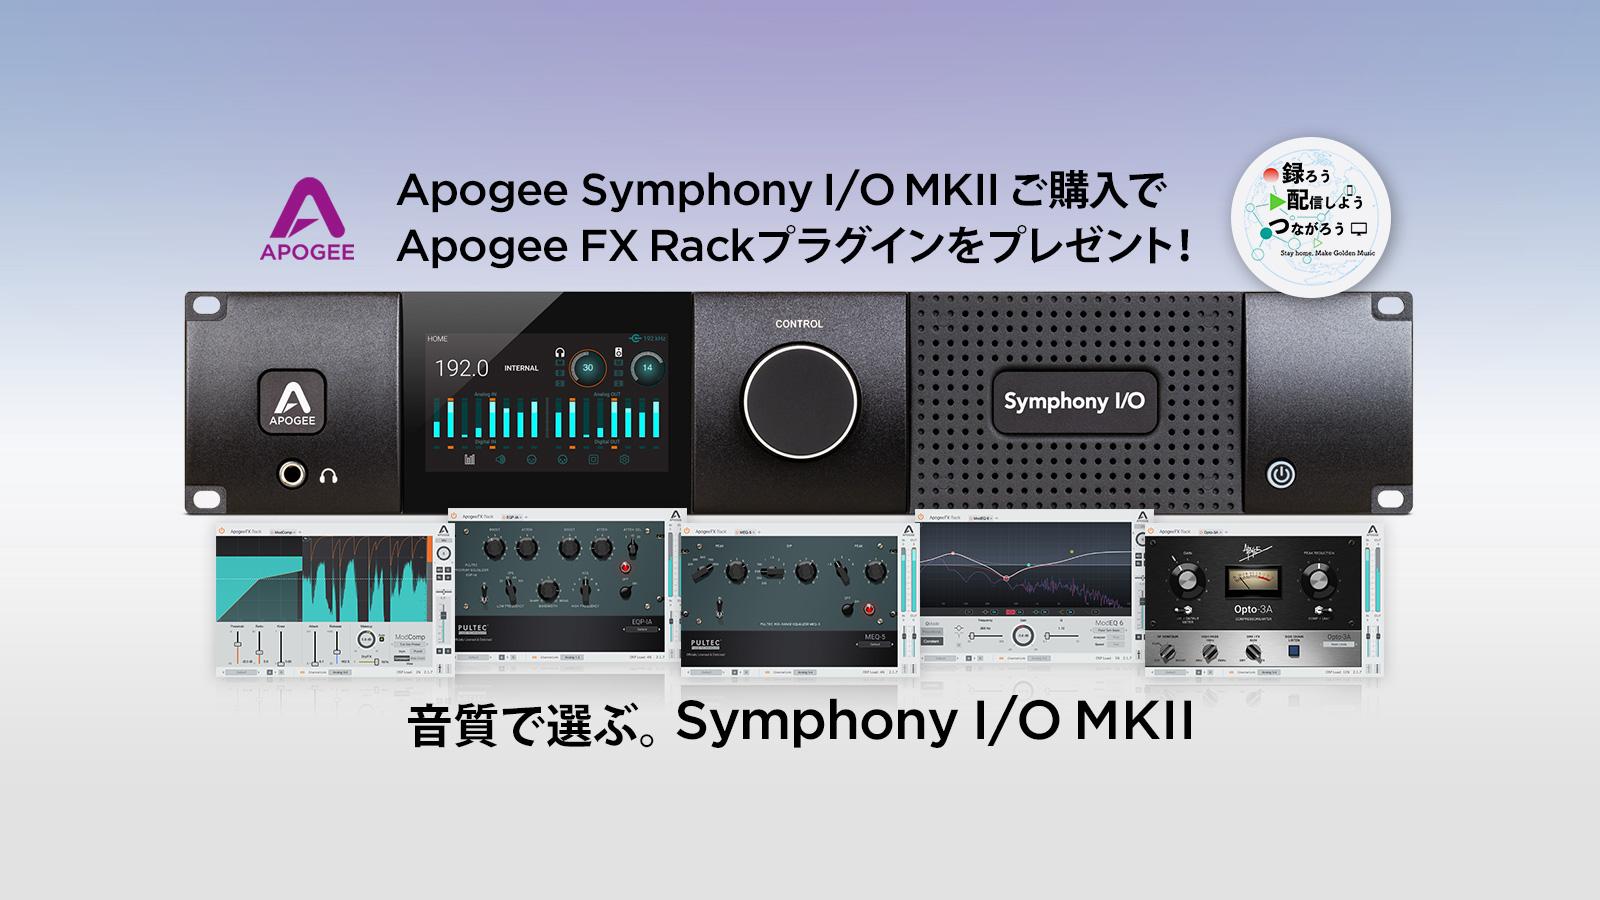 Apogee Symphony I/O MKII ご購入で Apogee FX Rackプラグインをプレゼント!